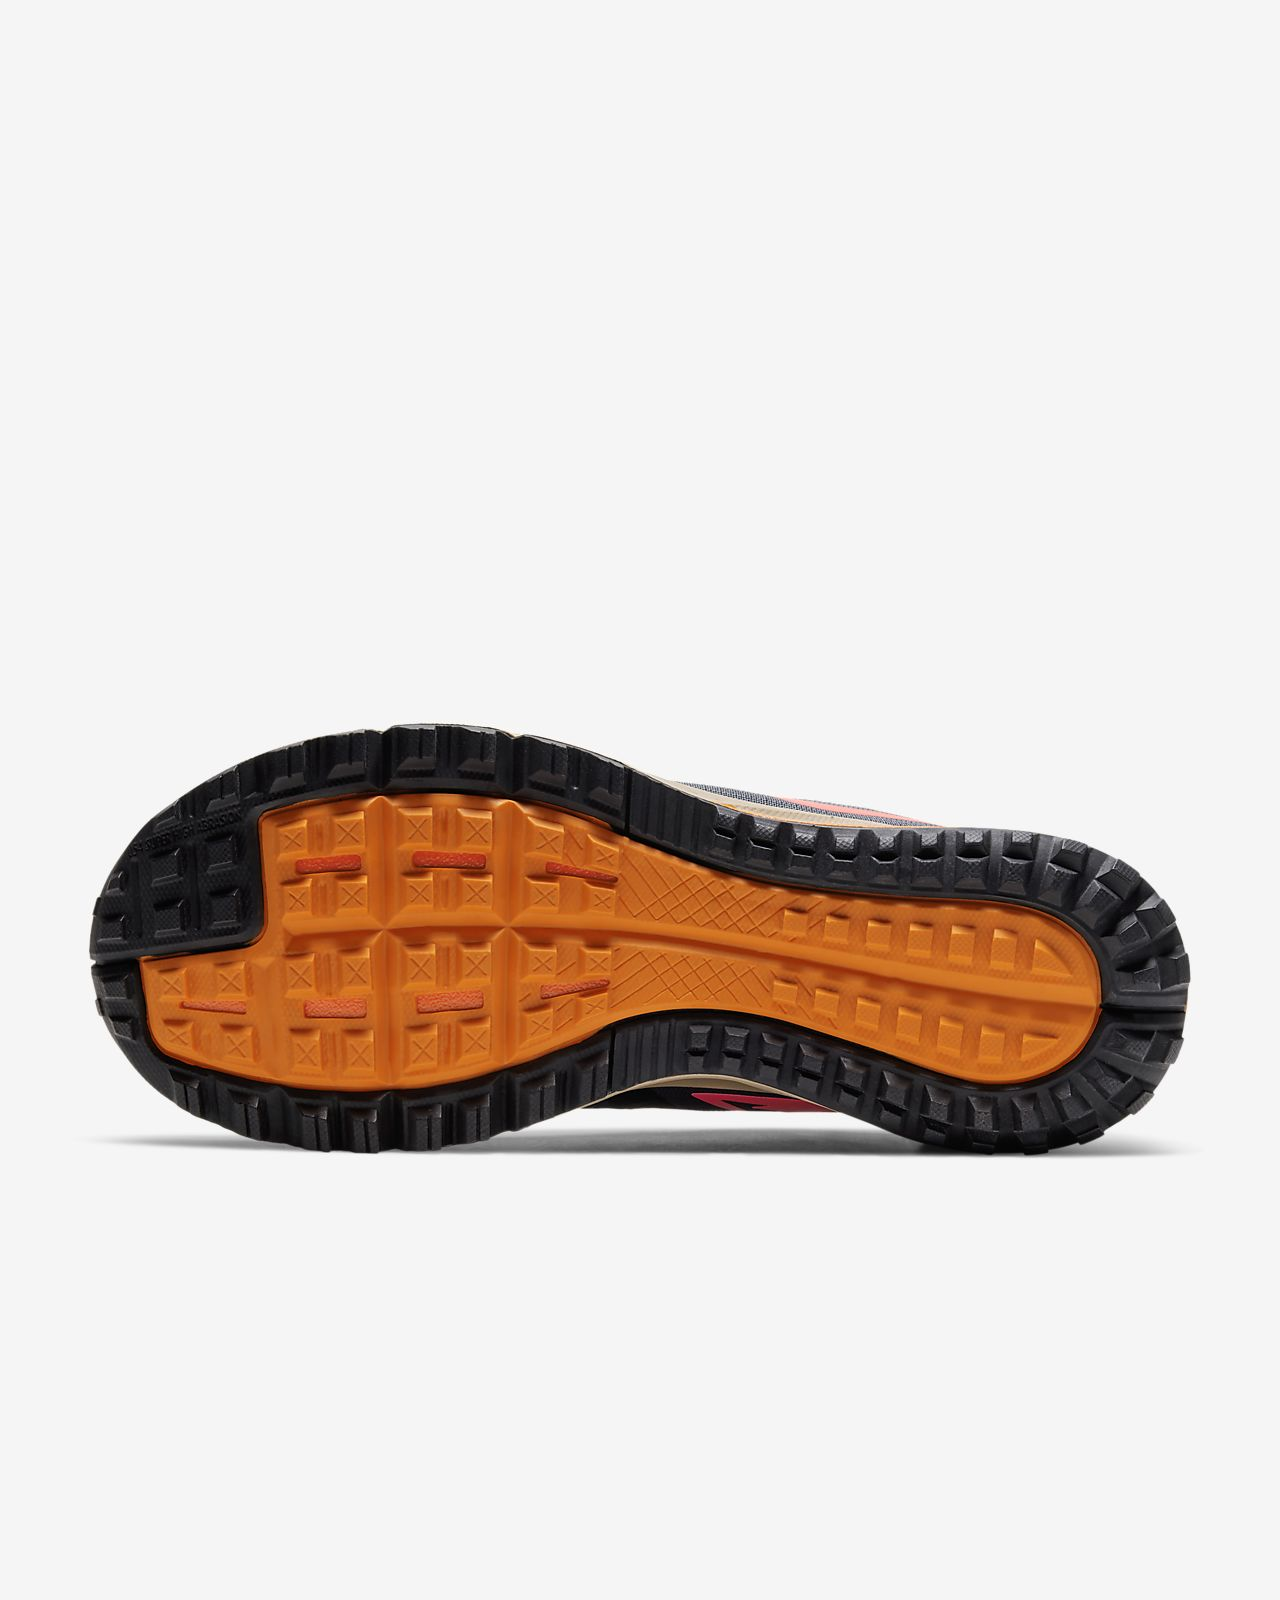 TXIP903131 Taglia 8.5 Italia Nike Giugno 26, 2017 Uomini